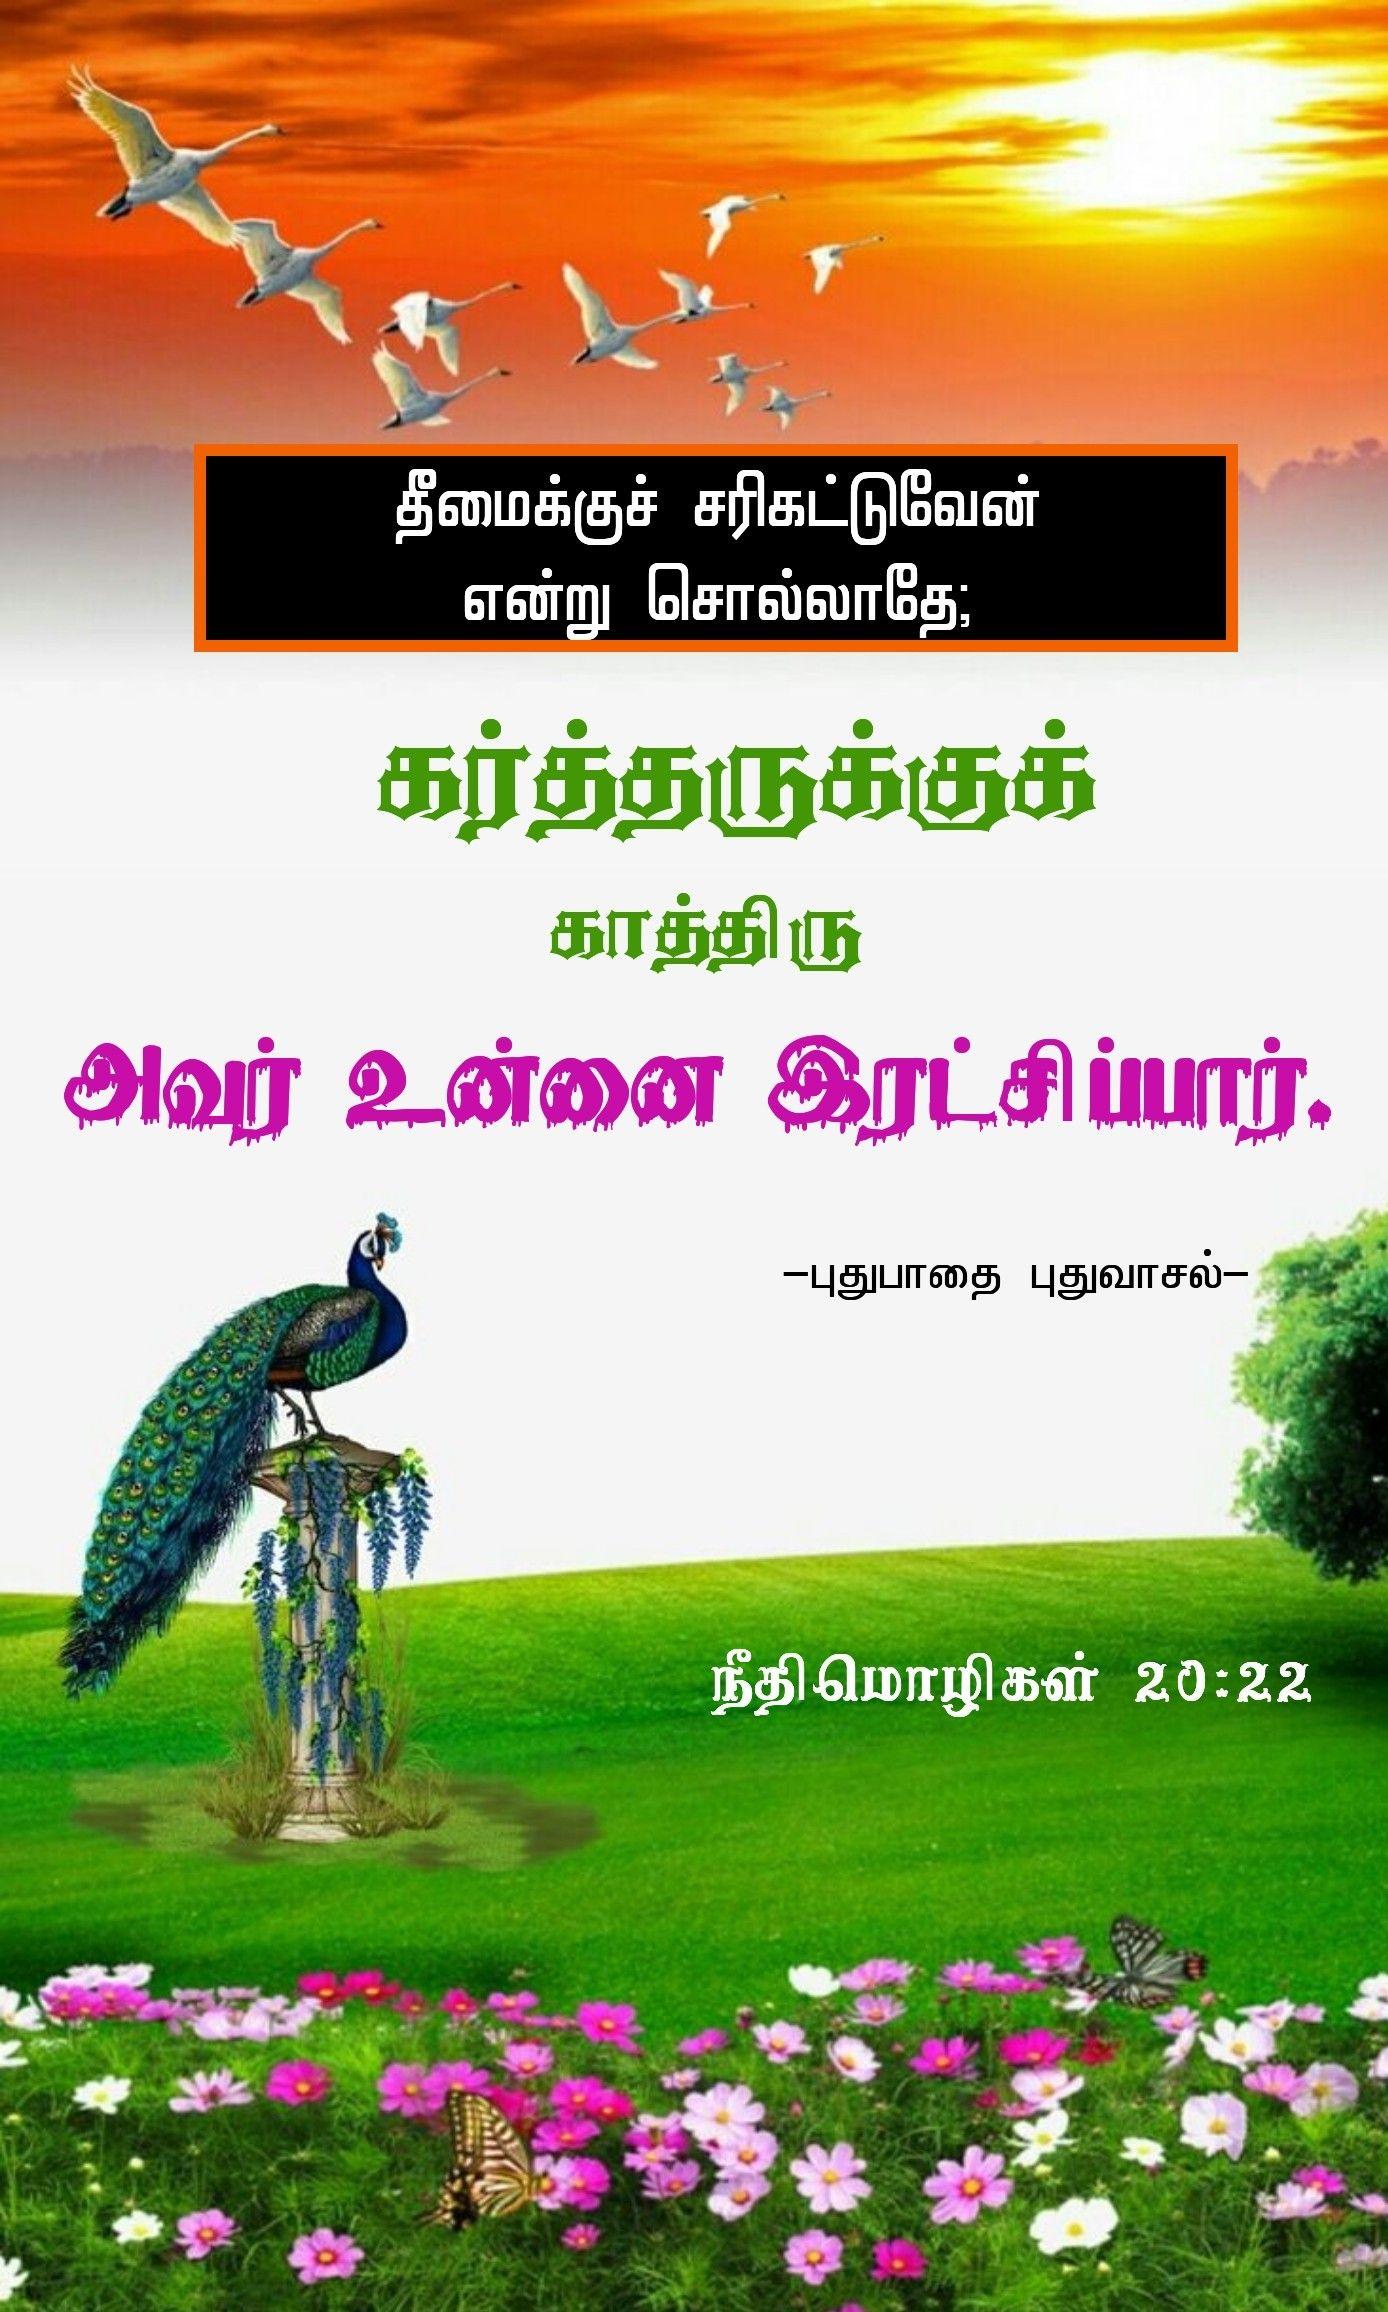 Pin by Kevinjca on Bible verse wallpaper Tamil bible